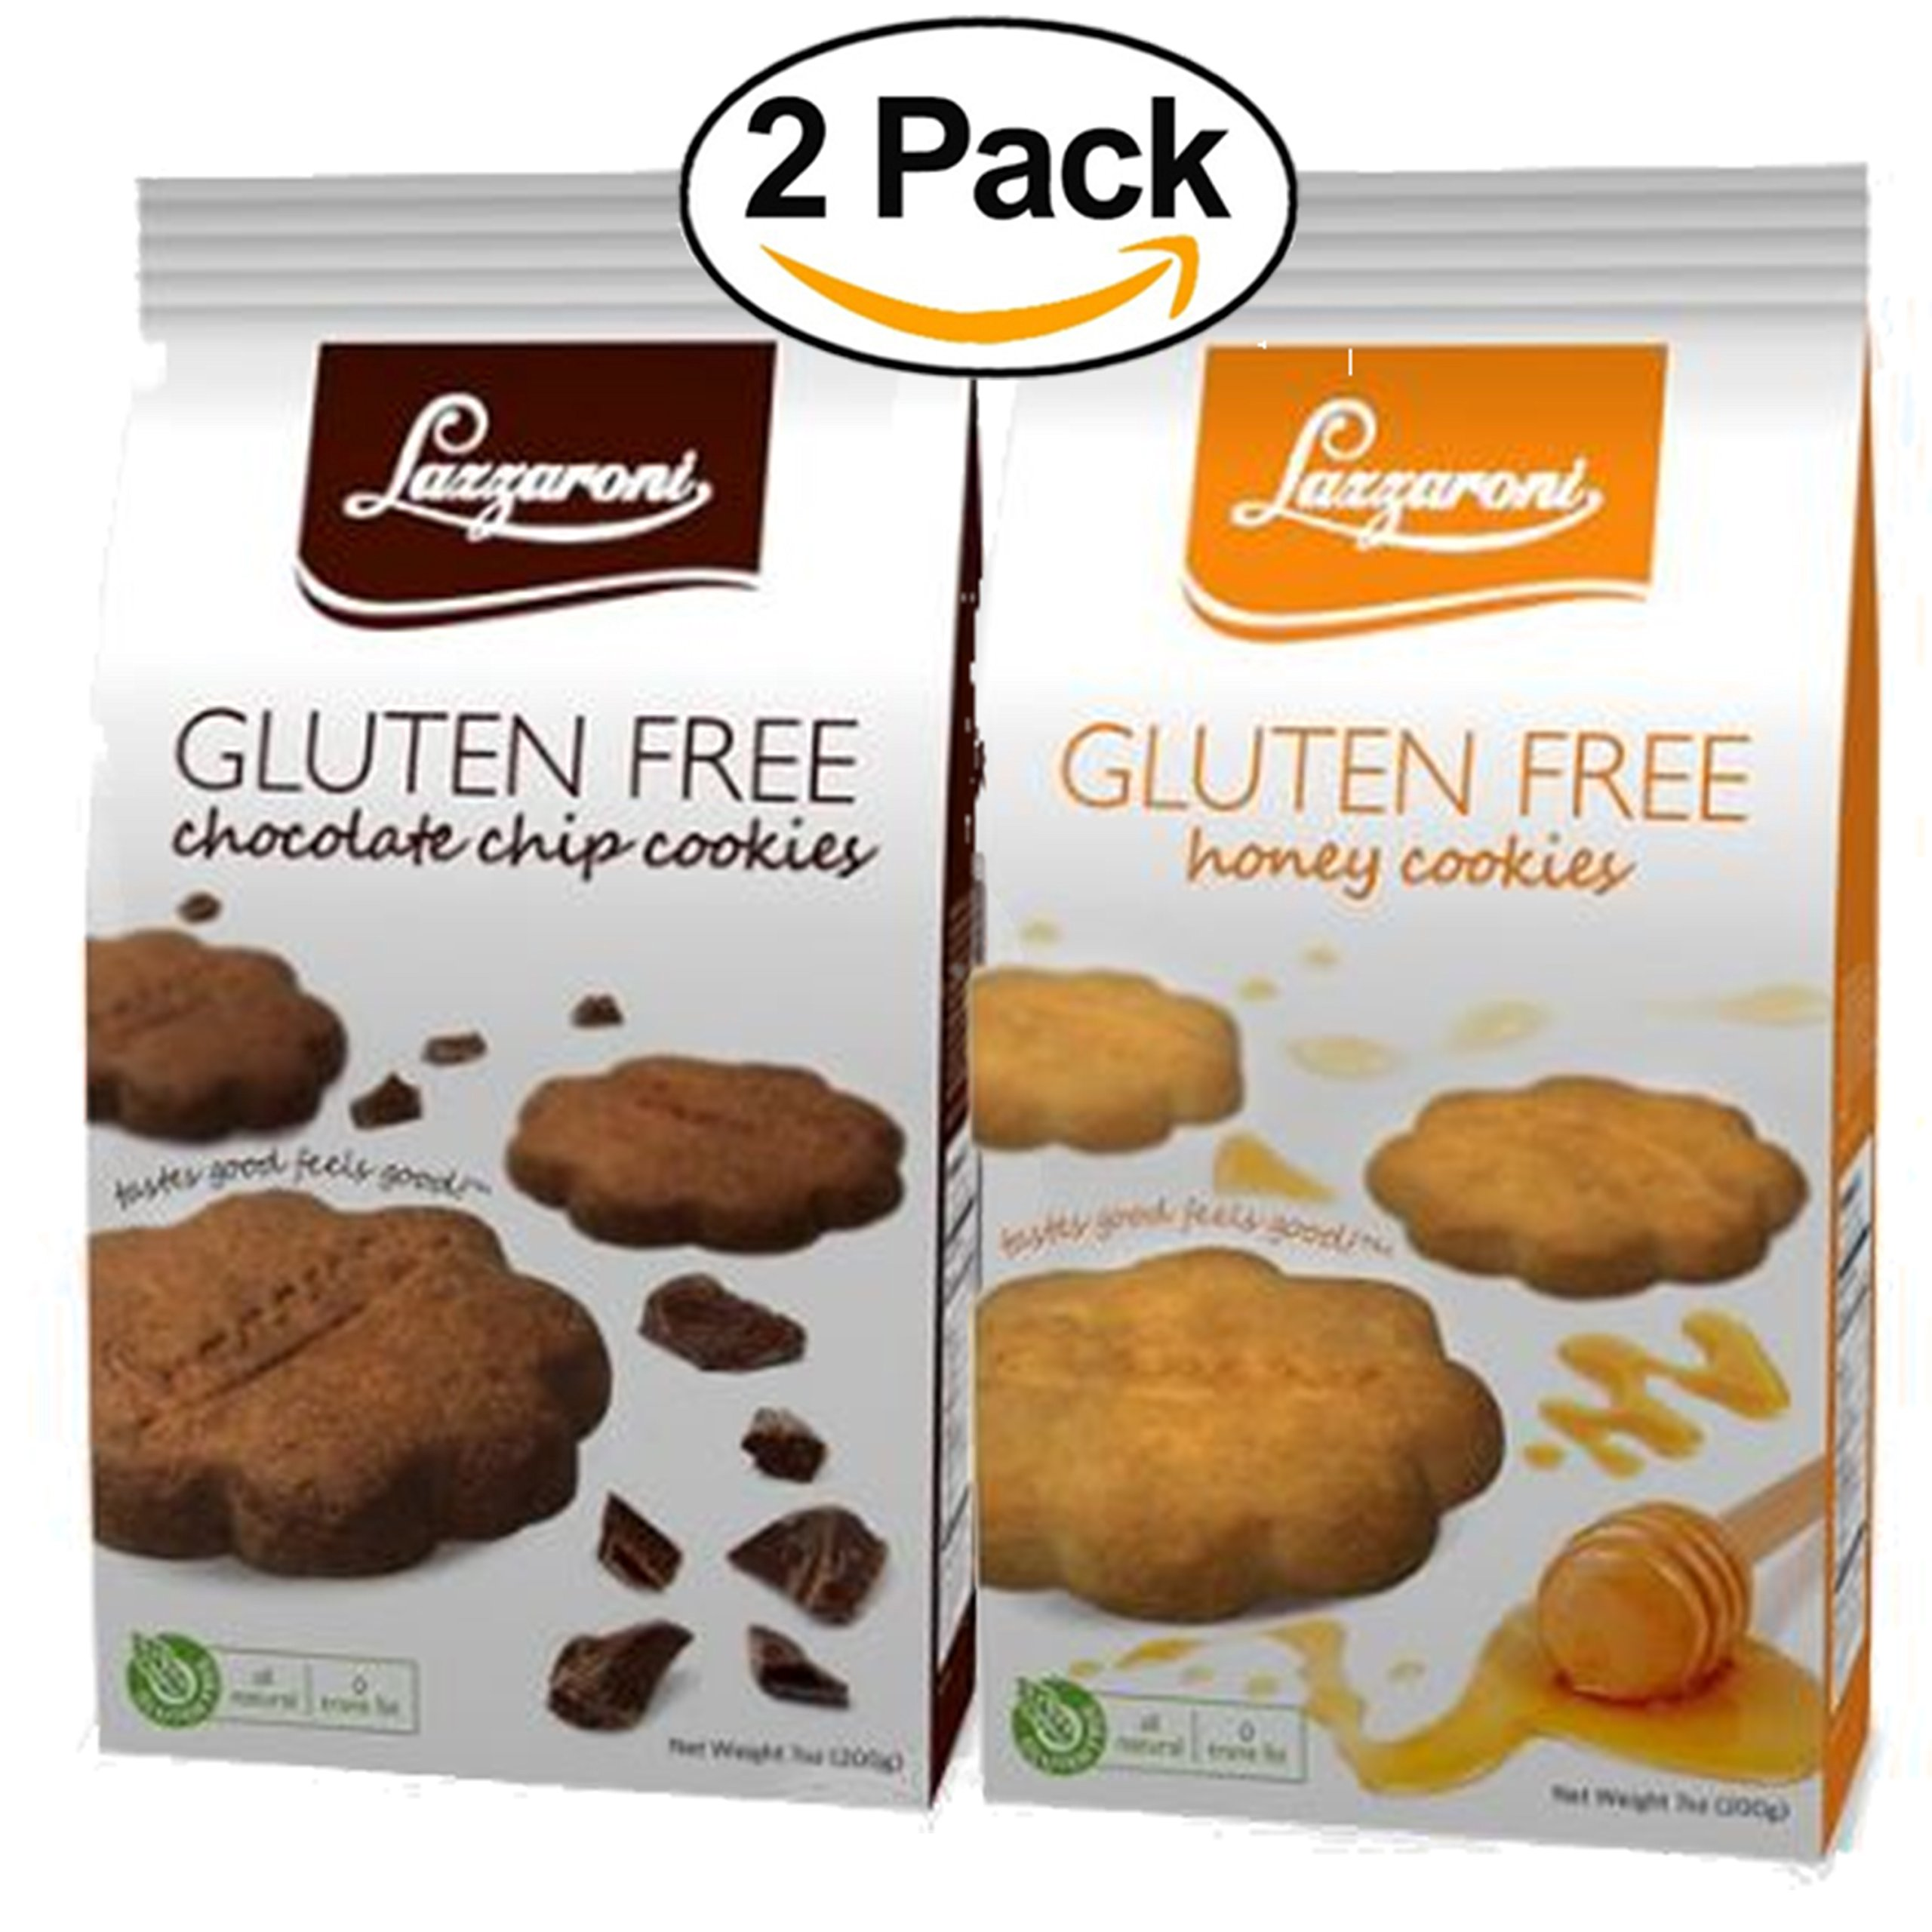 Lazzaroni Gluten Free Honey Cookies 7oz % Cocoa Chip Cookies 7oz BUNDLE